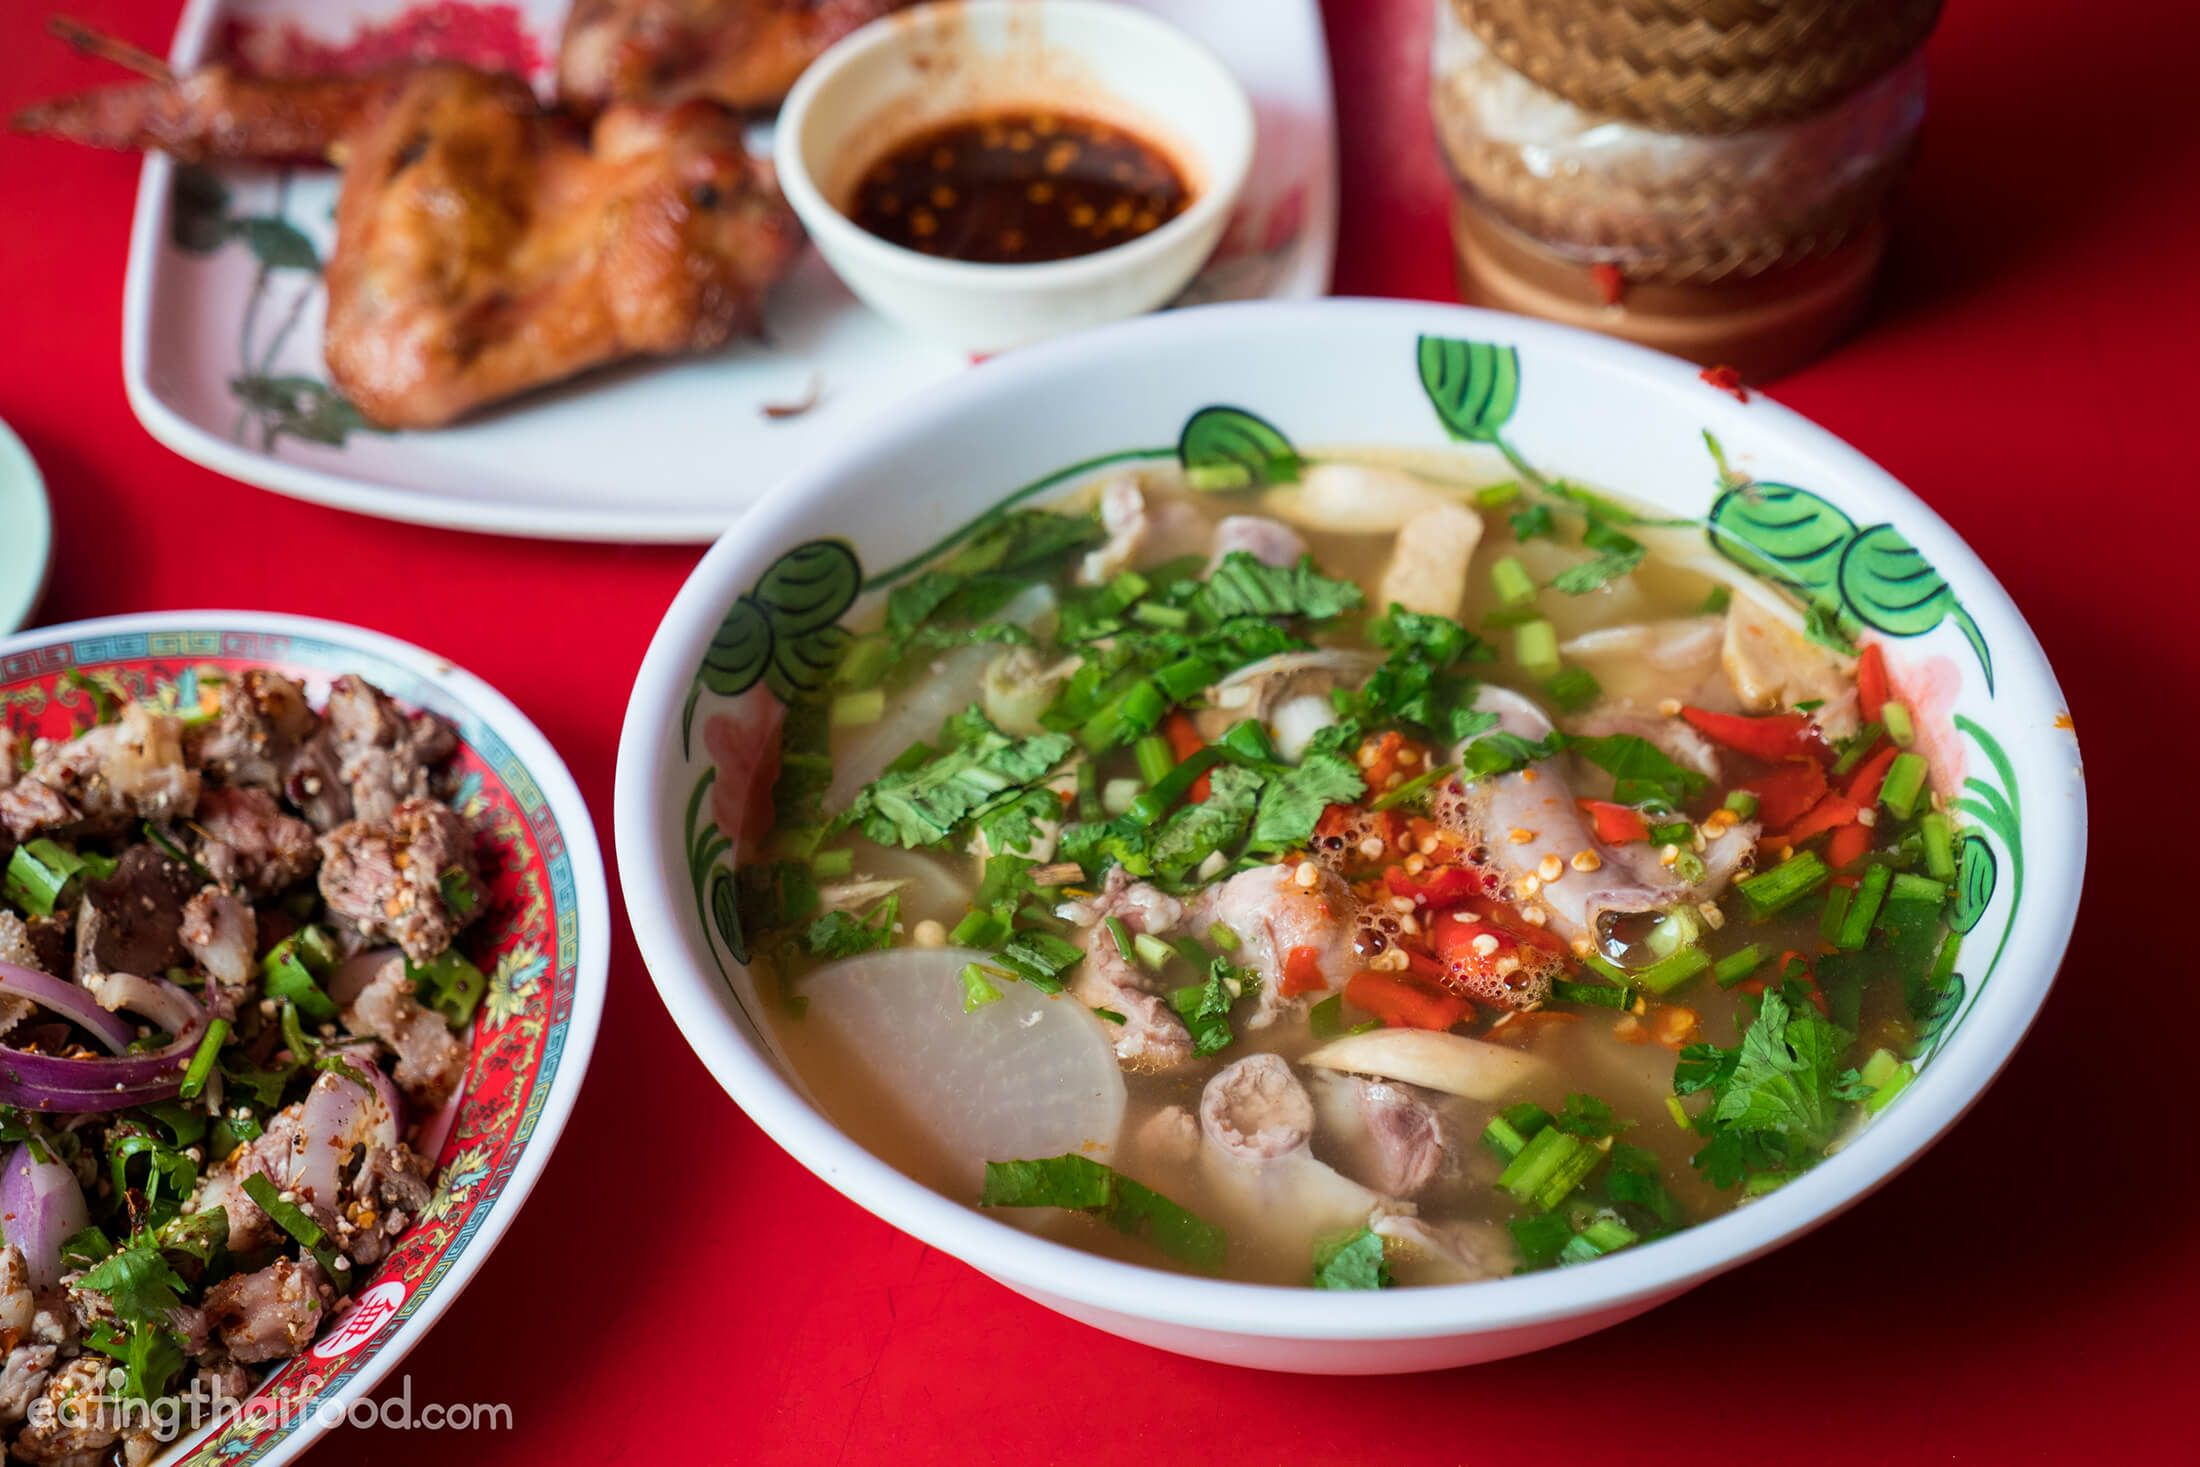 Real deal isaan food in bangkok at som tam jay so in this thai green papaya salad recipe youll learn to make thai street food style green papaya salad its easy to make and tastes delicious forumfinder Image collections